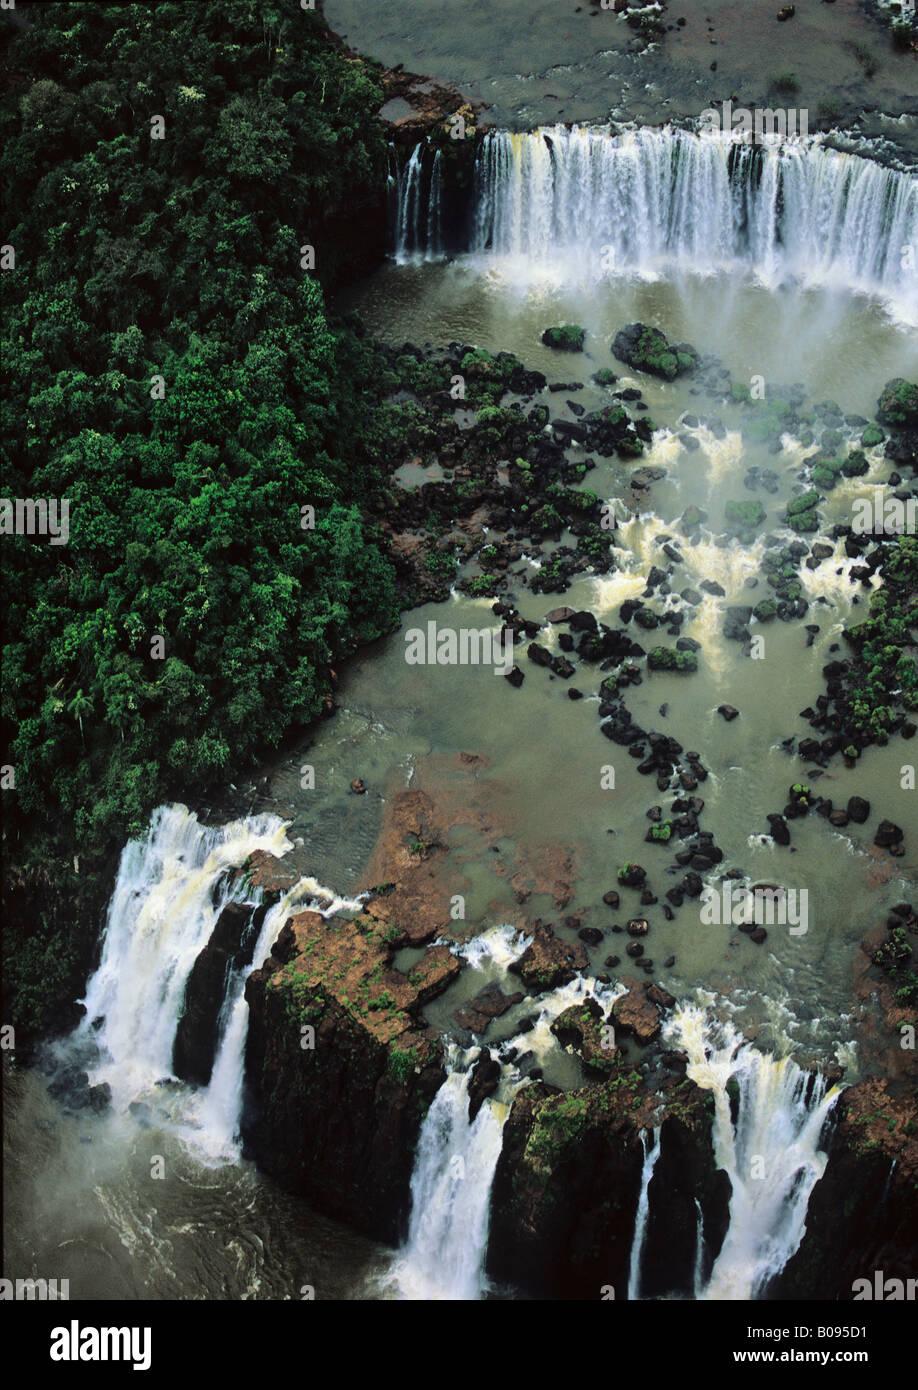 South America, Brazil, Argentina, Igwazu, Igwacu Falls thunder into the Igwacu River below. Stock Photo